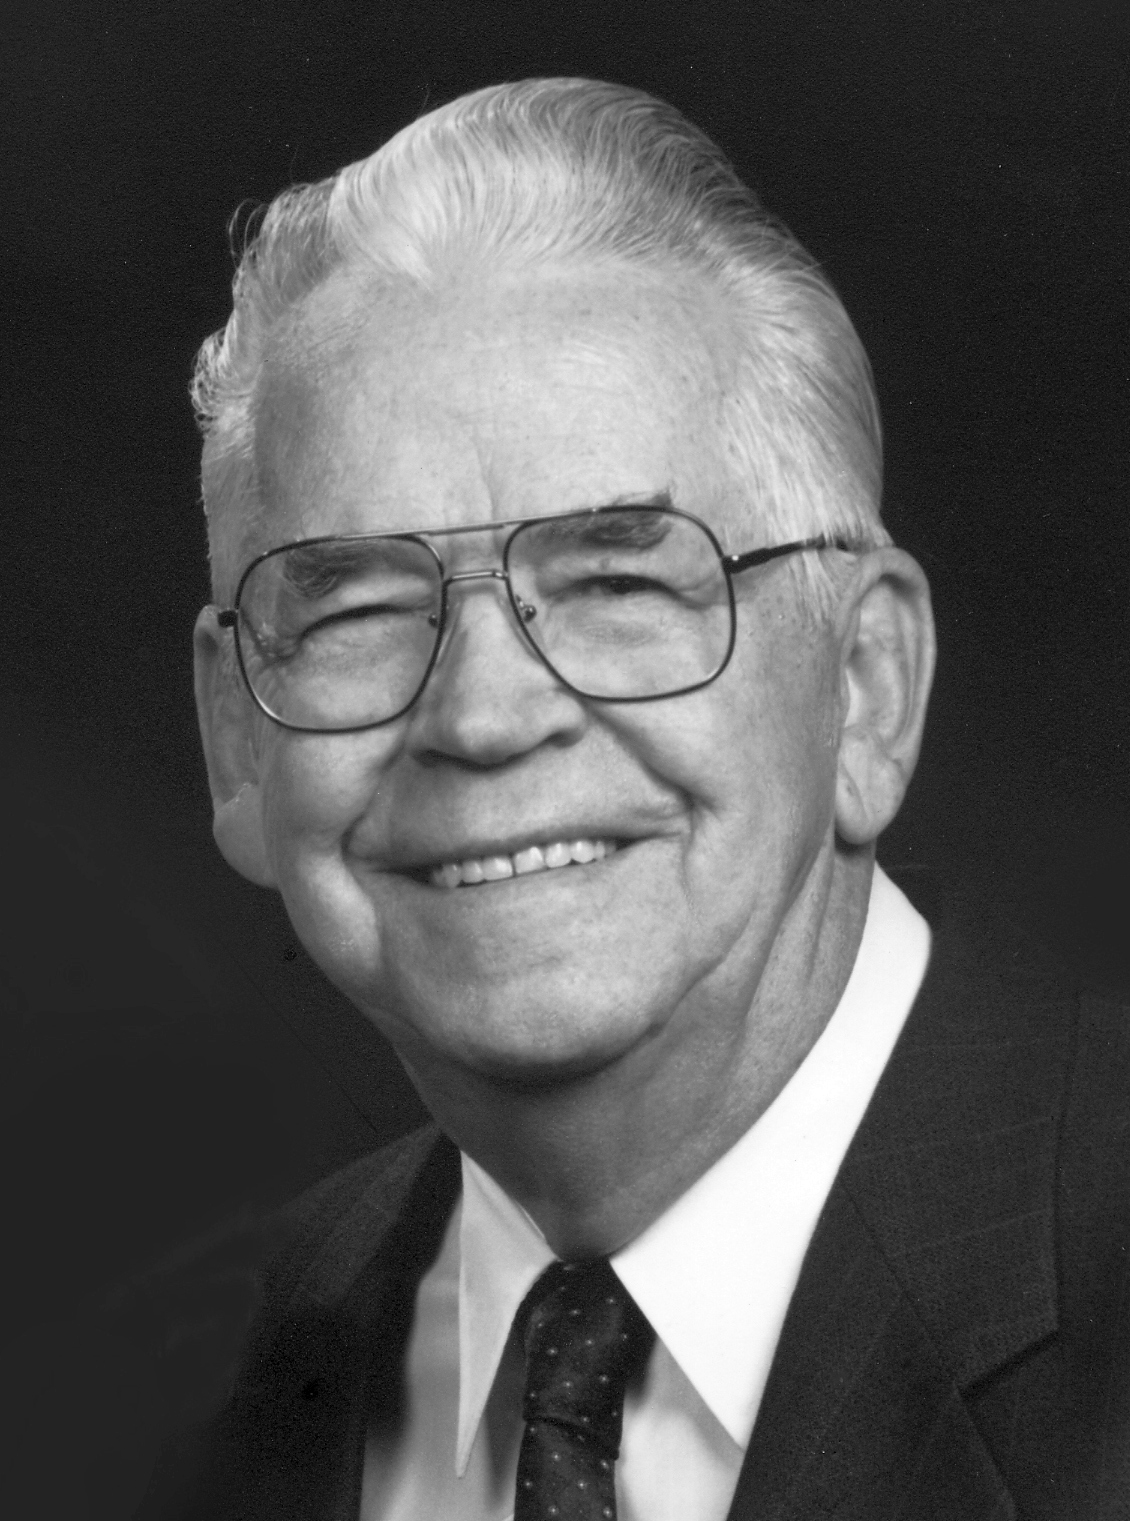 Bunderson, Grant Victor